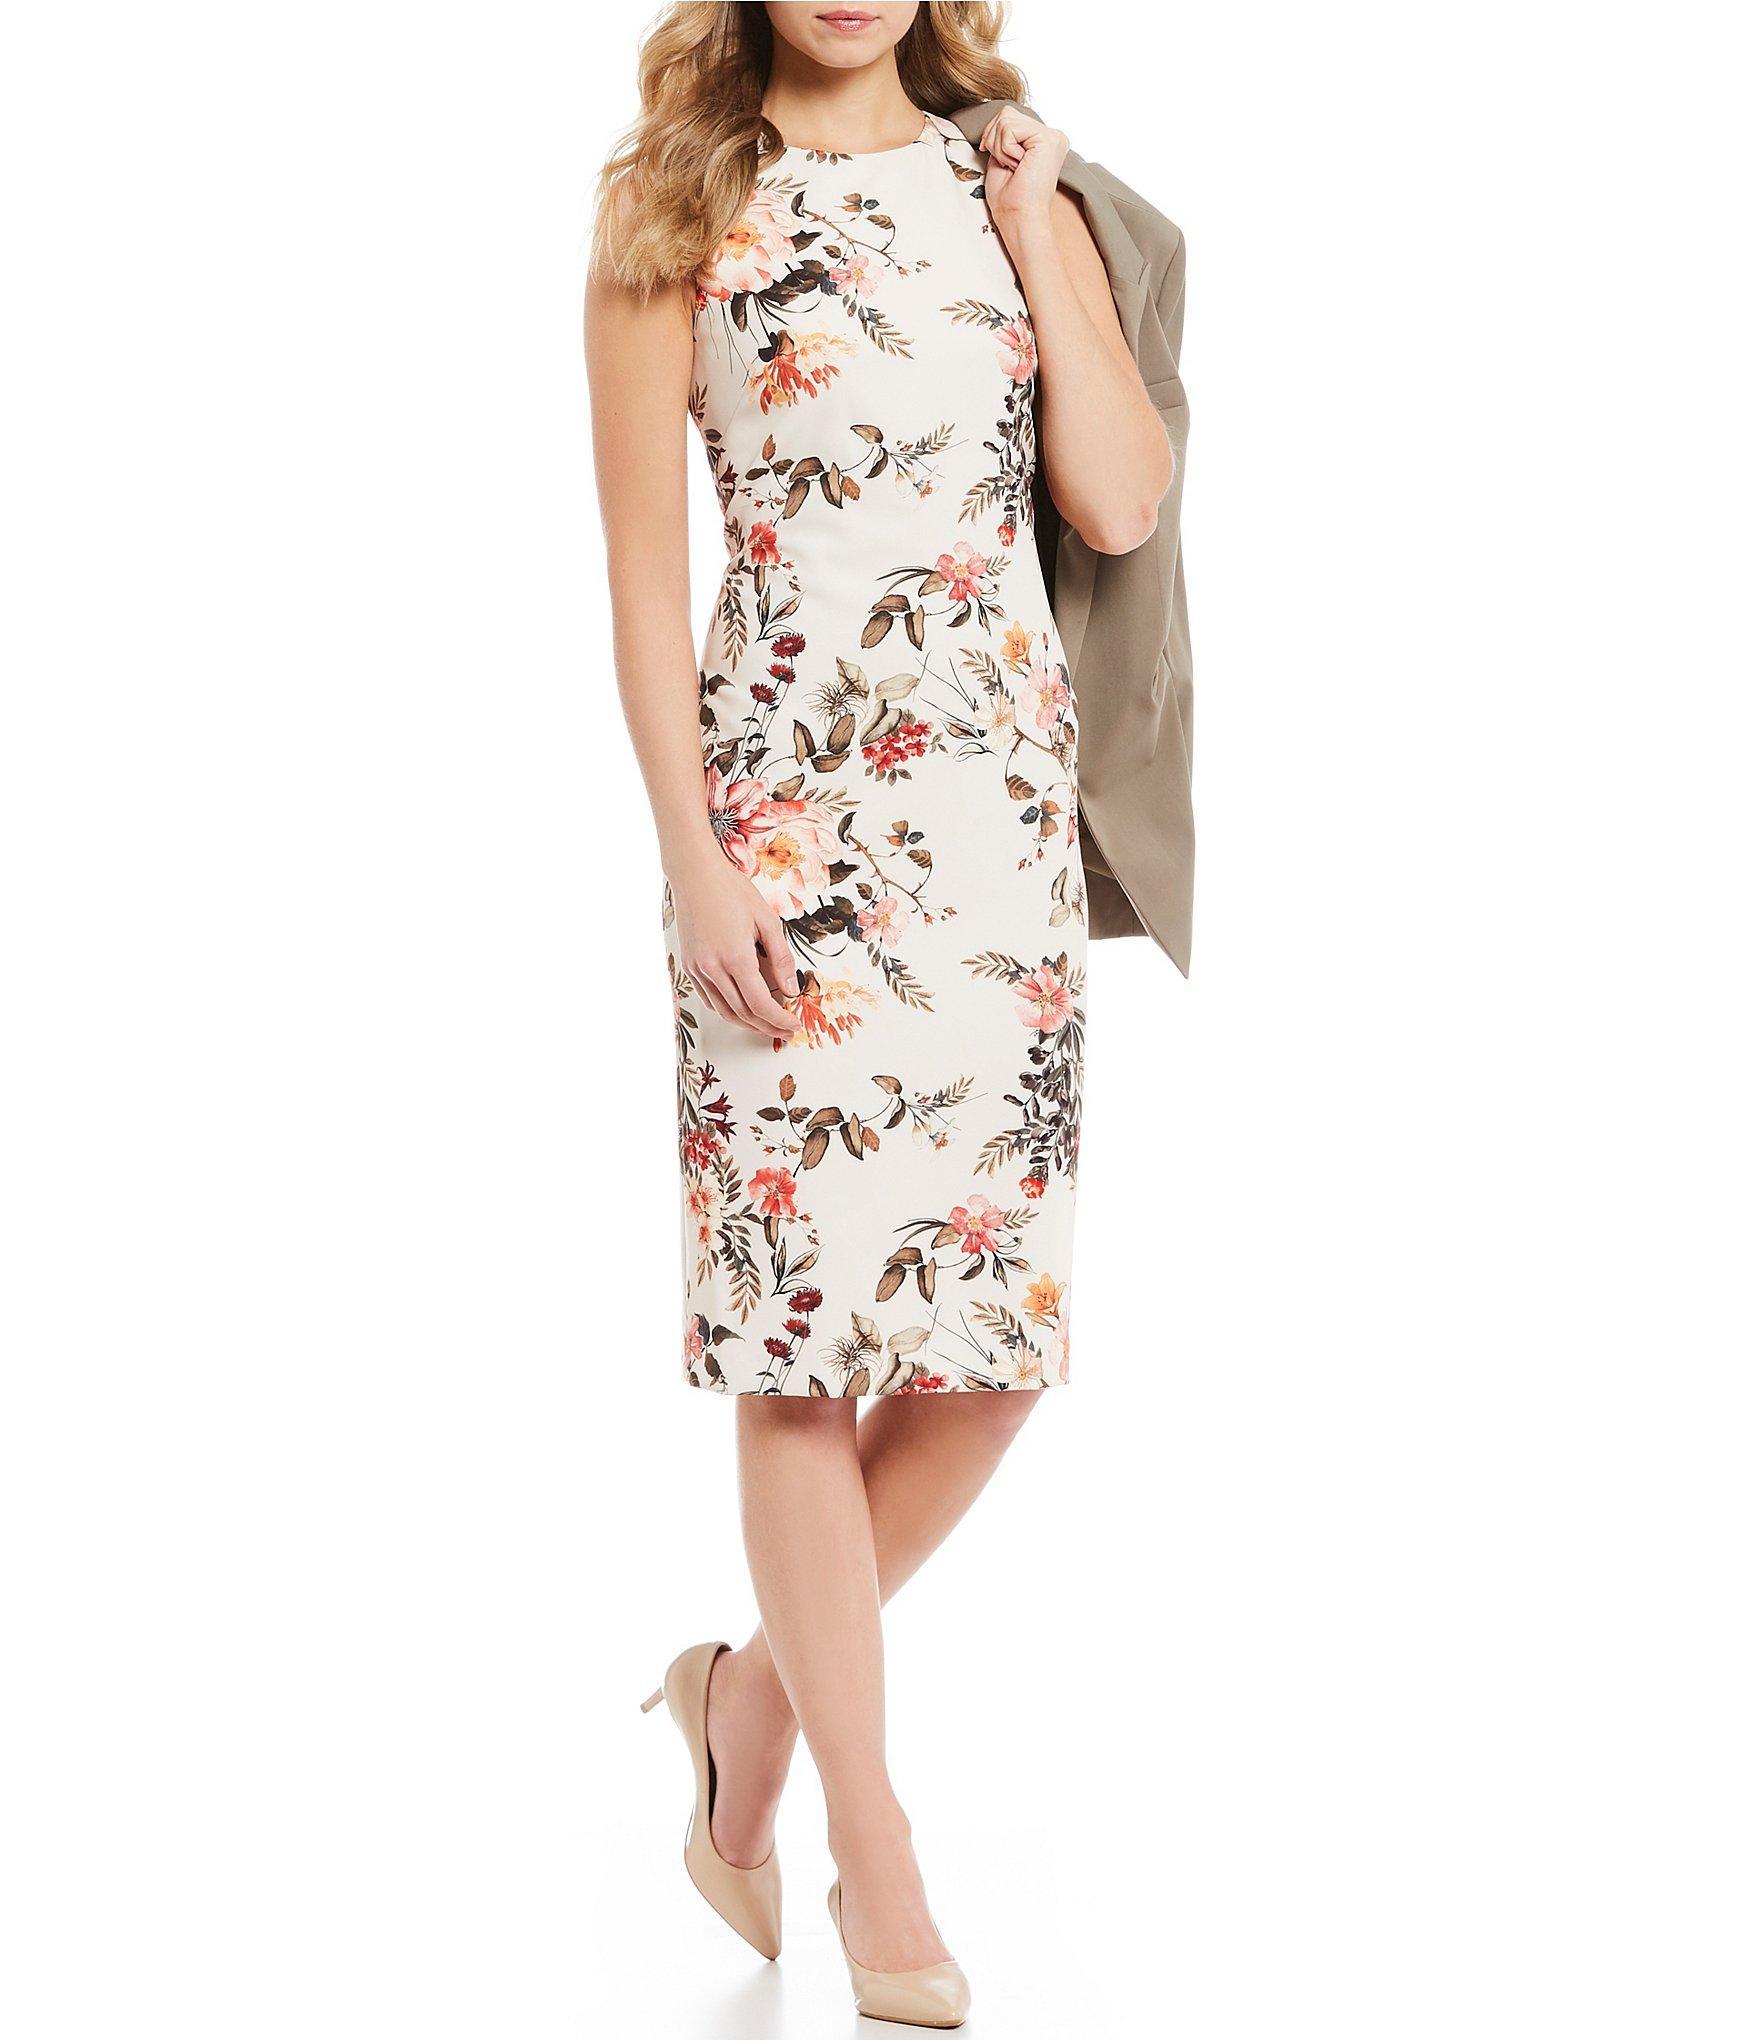 b9d4f46246d Antonio Melani Jadie Floral Print Sleeveless Midi Dress in White - Lyst